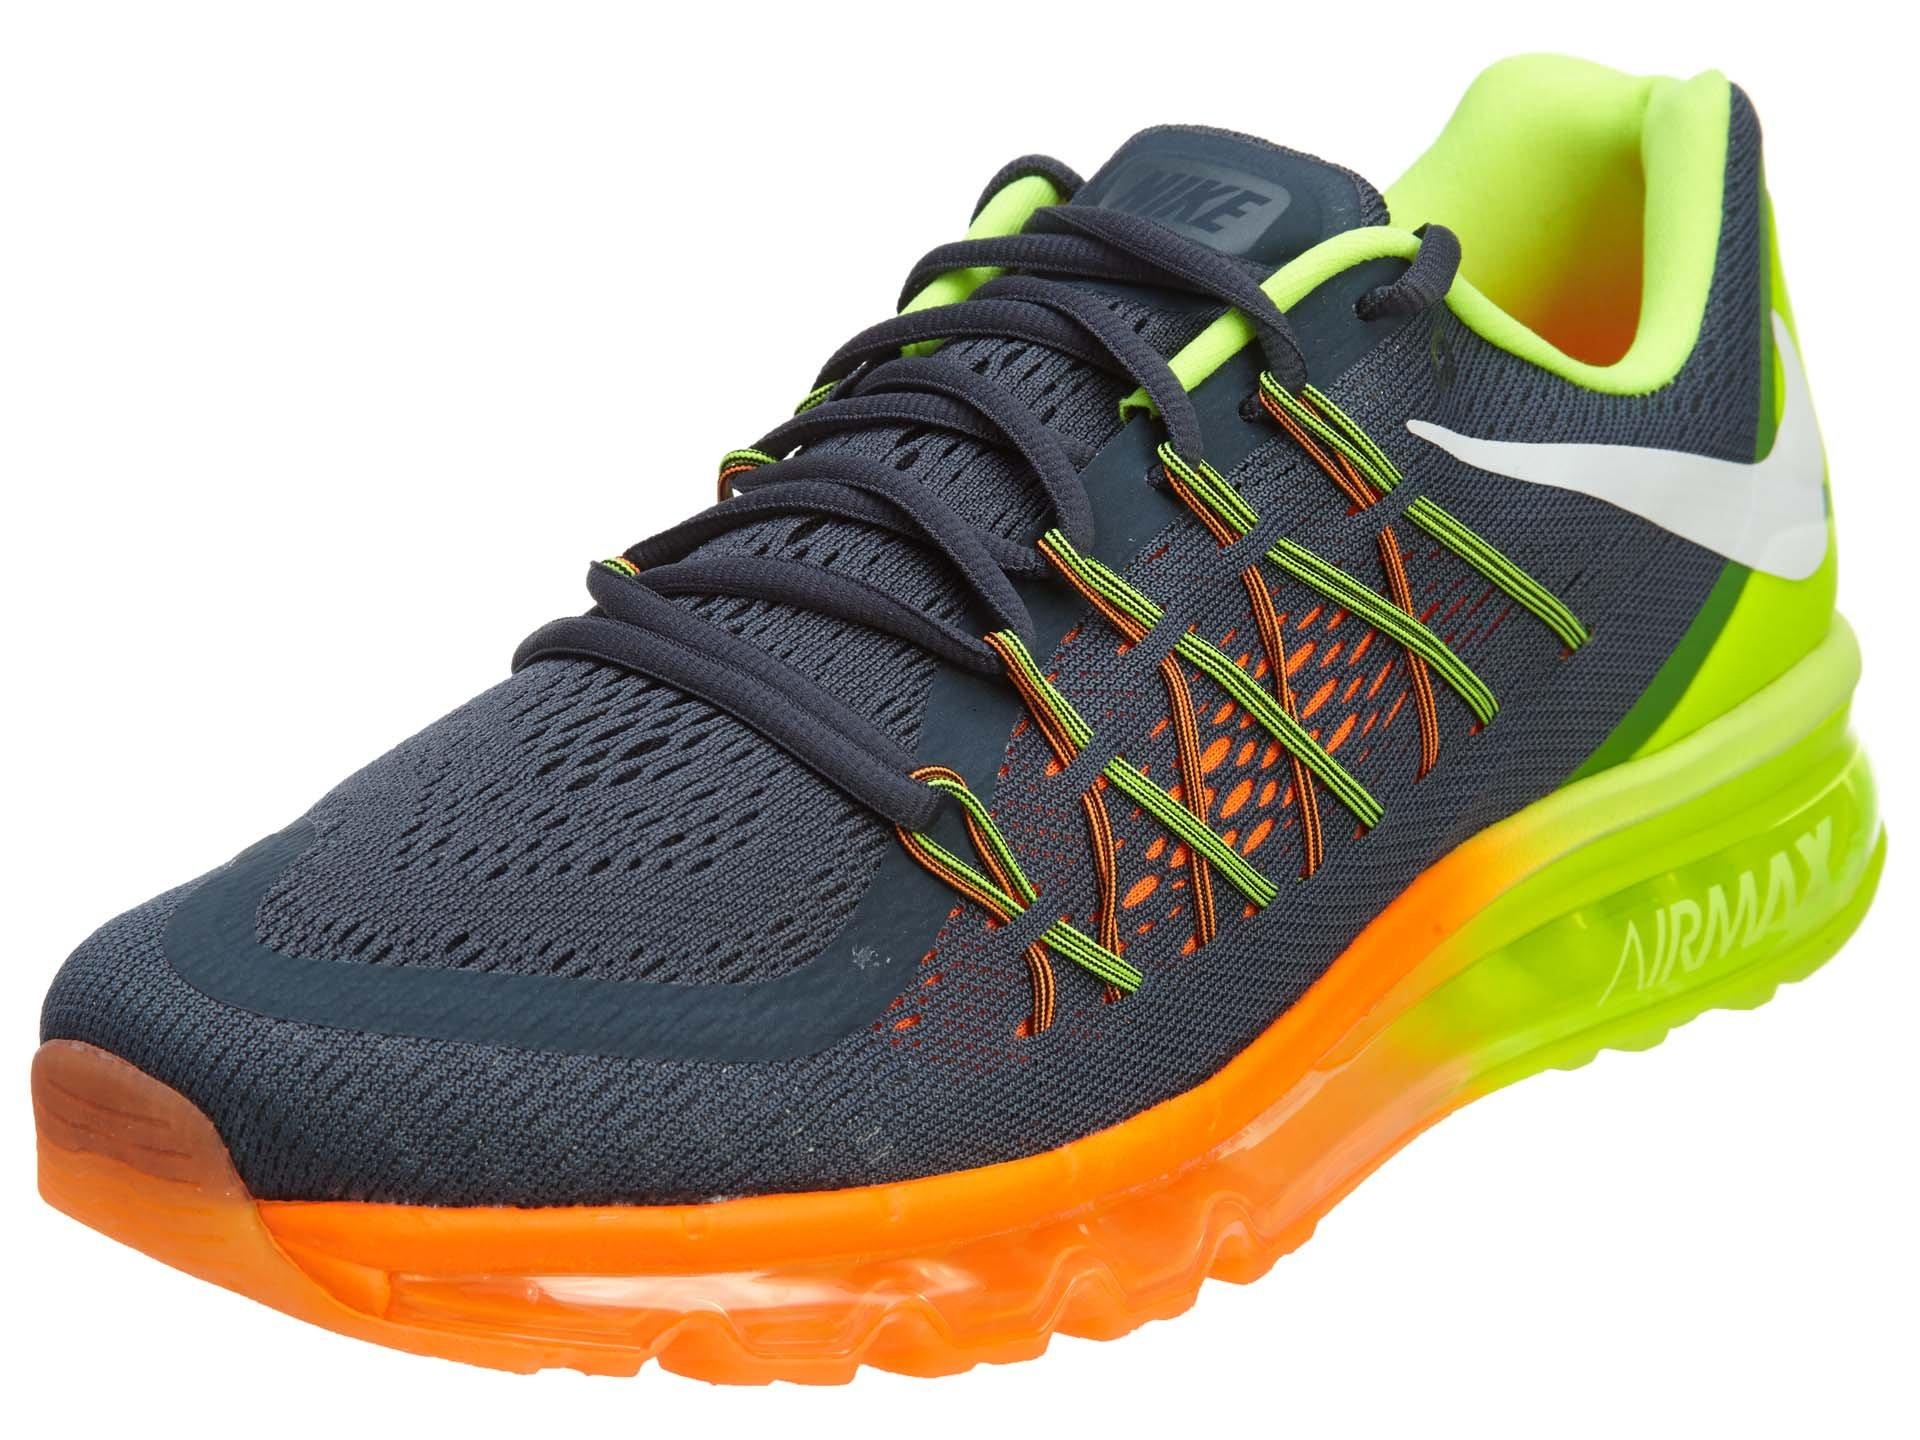 best service bc8e4 58054 Galleon - Nike Men s Air Max 2015 Clssc Chrcl White Vlt Ttl Orng Running  Shoe 9.5 Men US